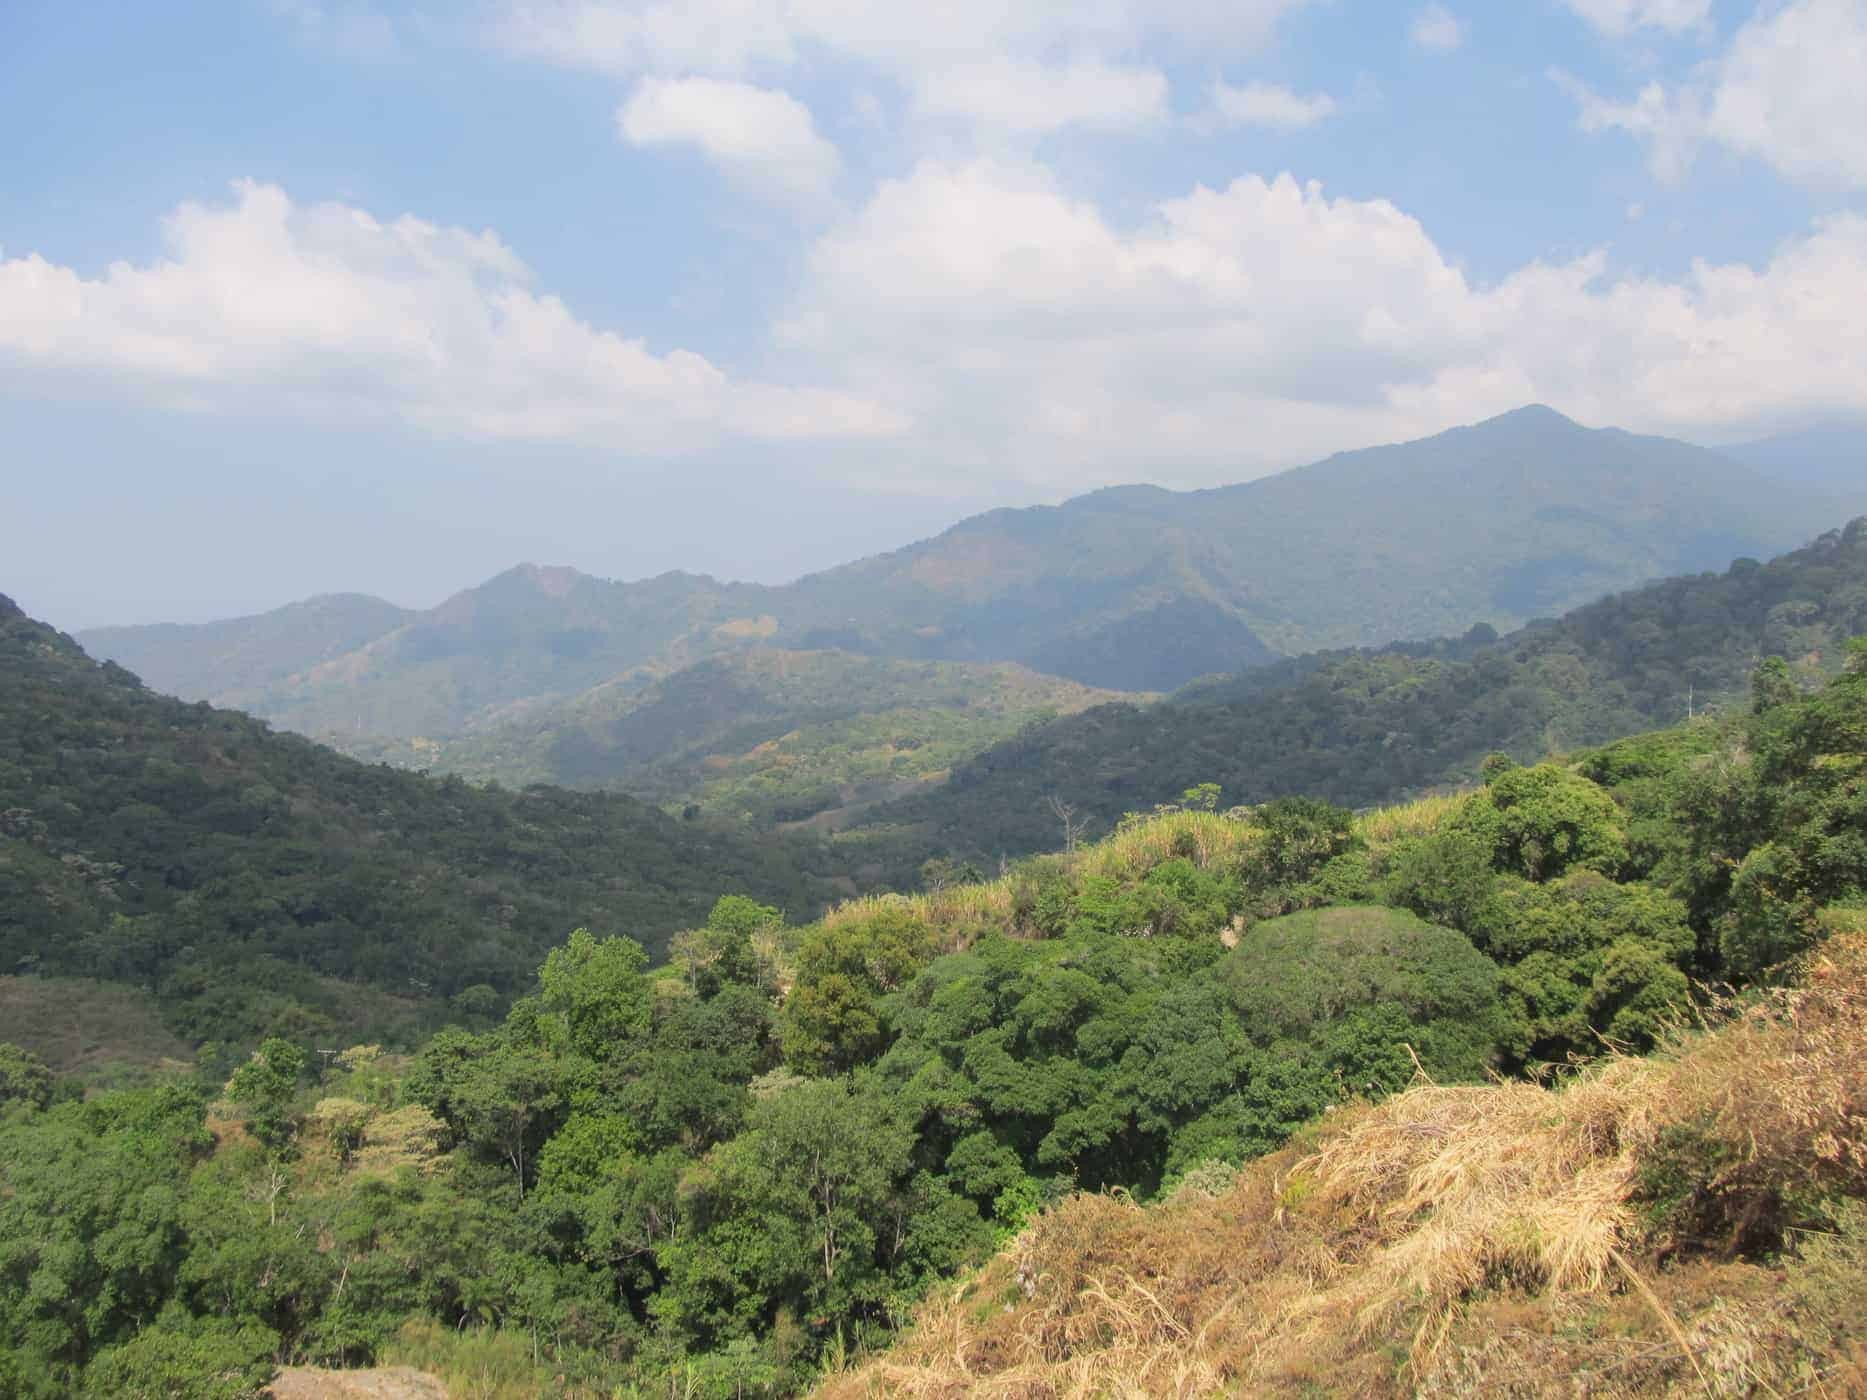 The lush mountain scenery around Minca, Colombia.